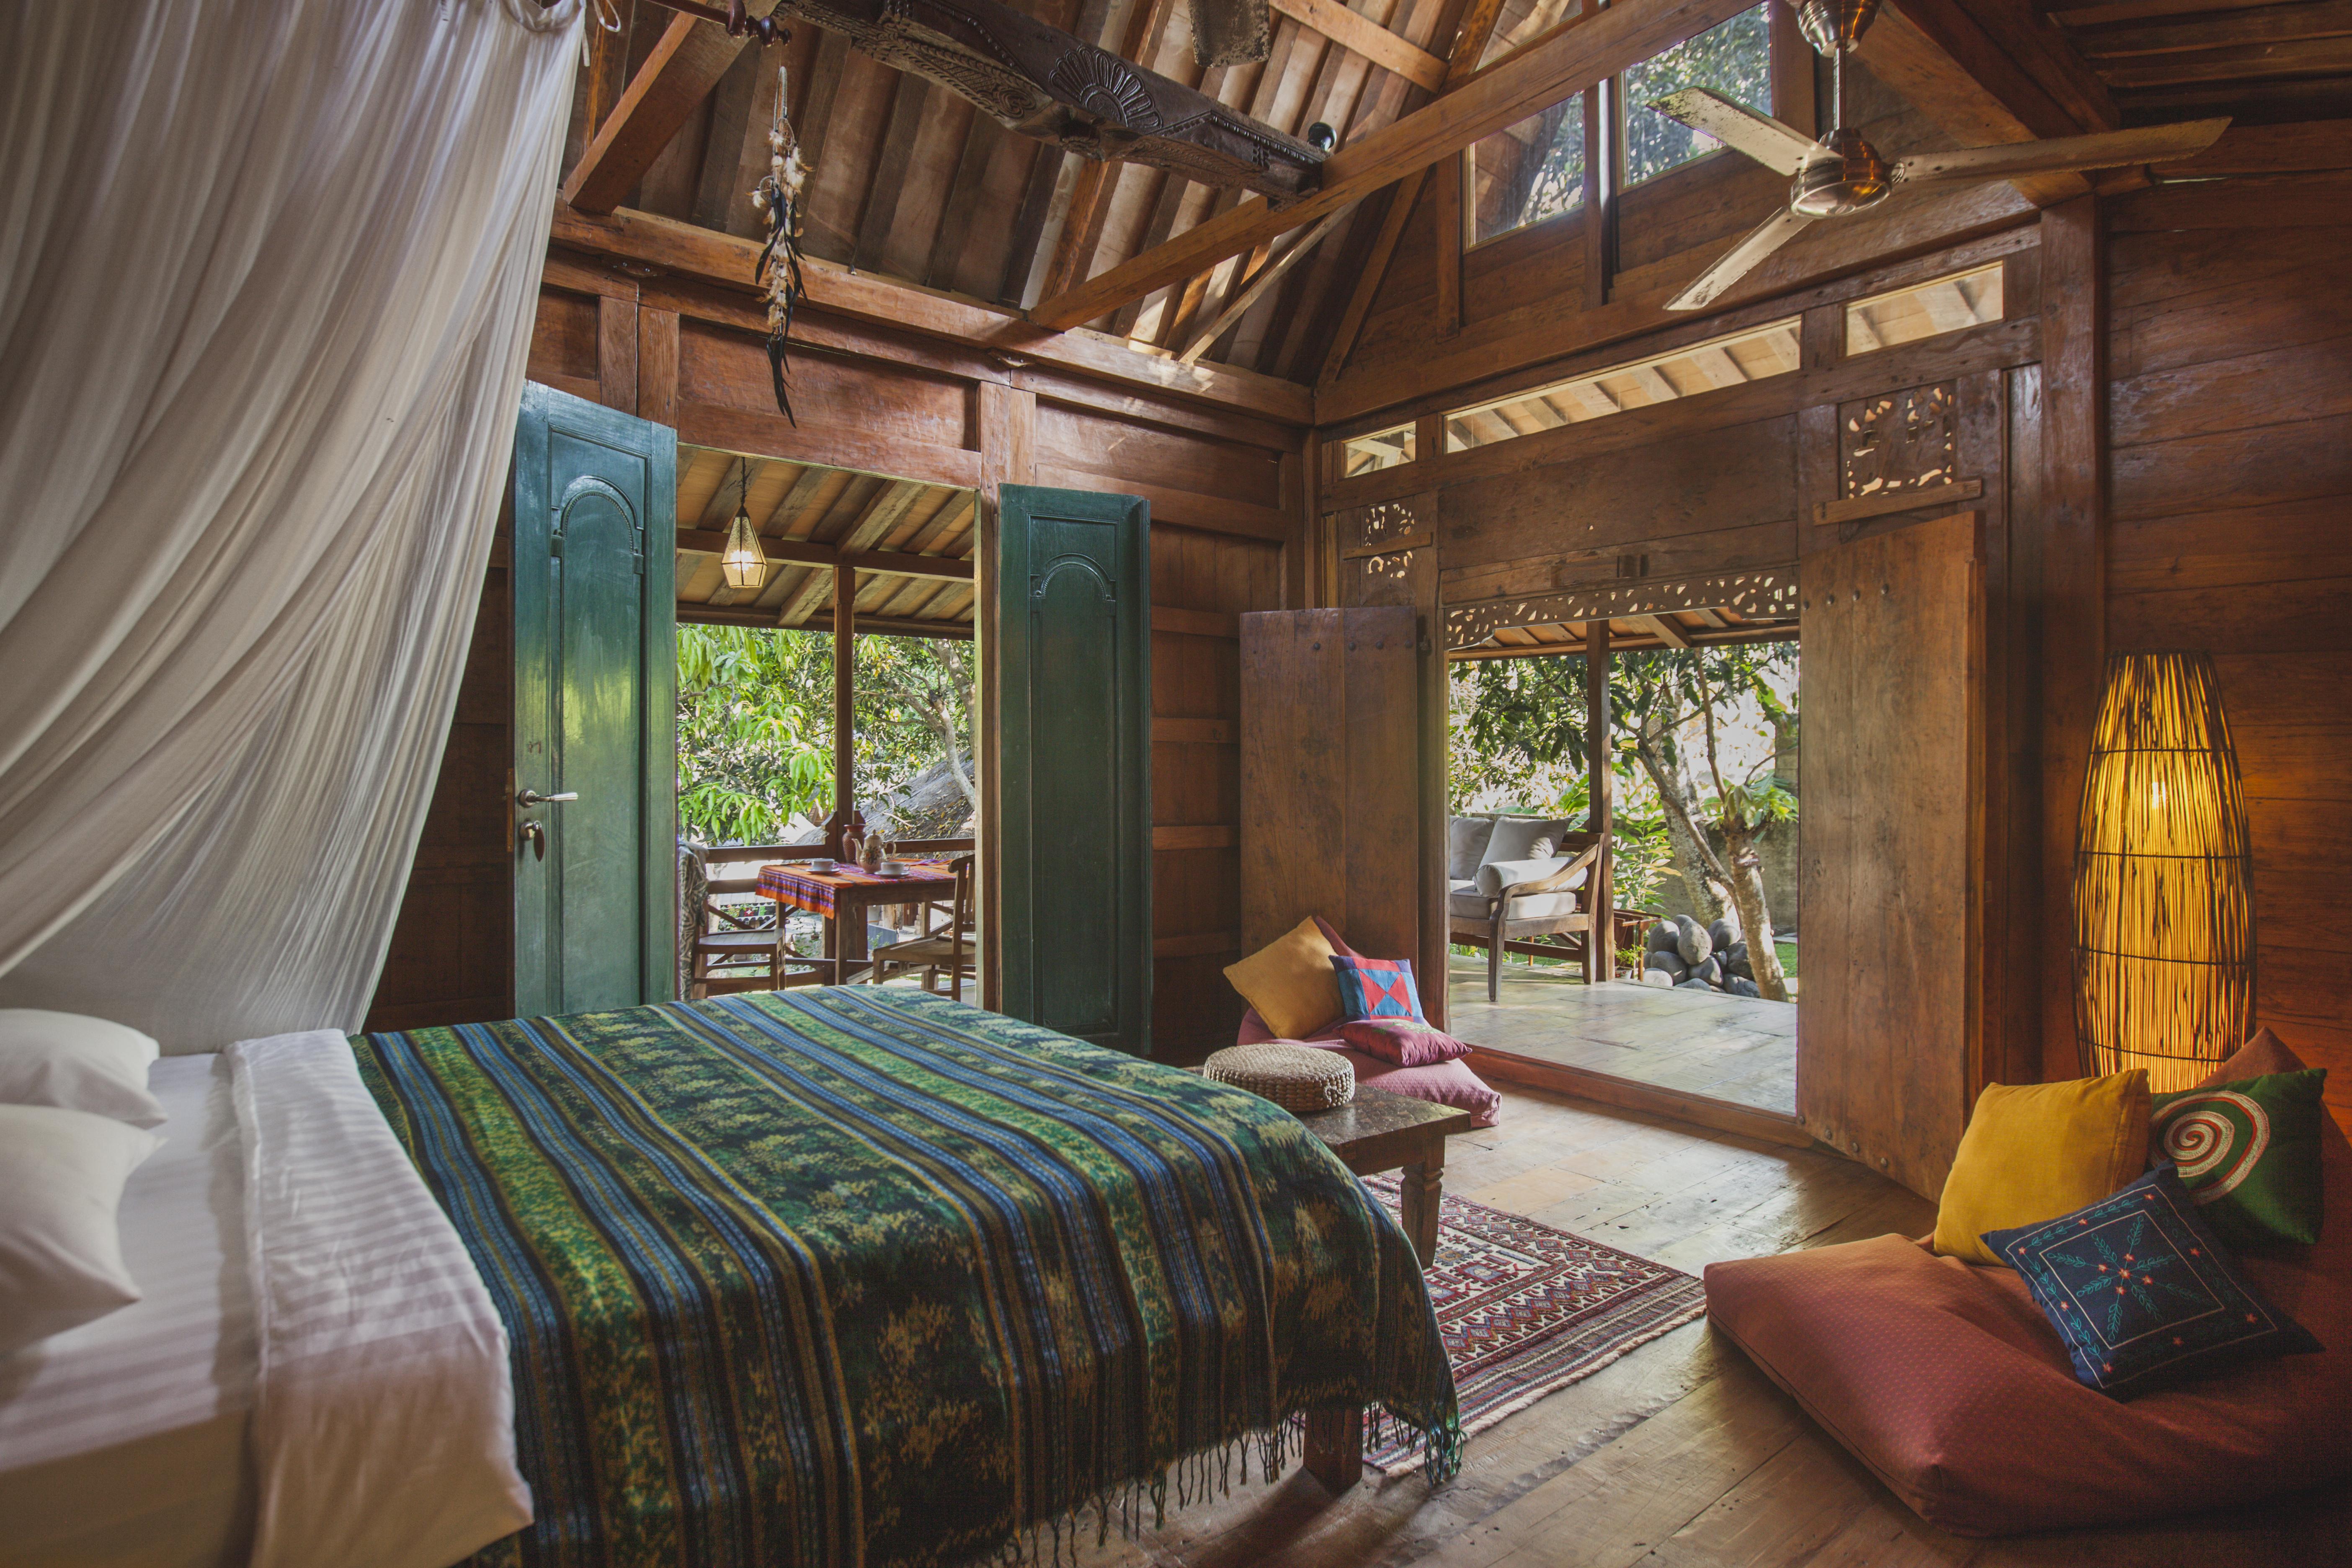 Ethnic Wooden House Villas For Rent In Kuta Utara Bali Indonesia